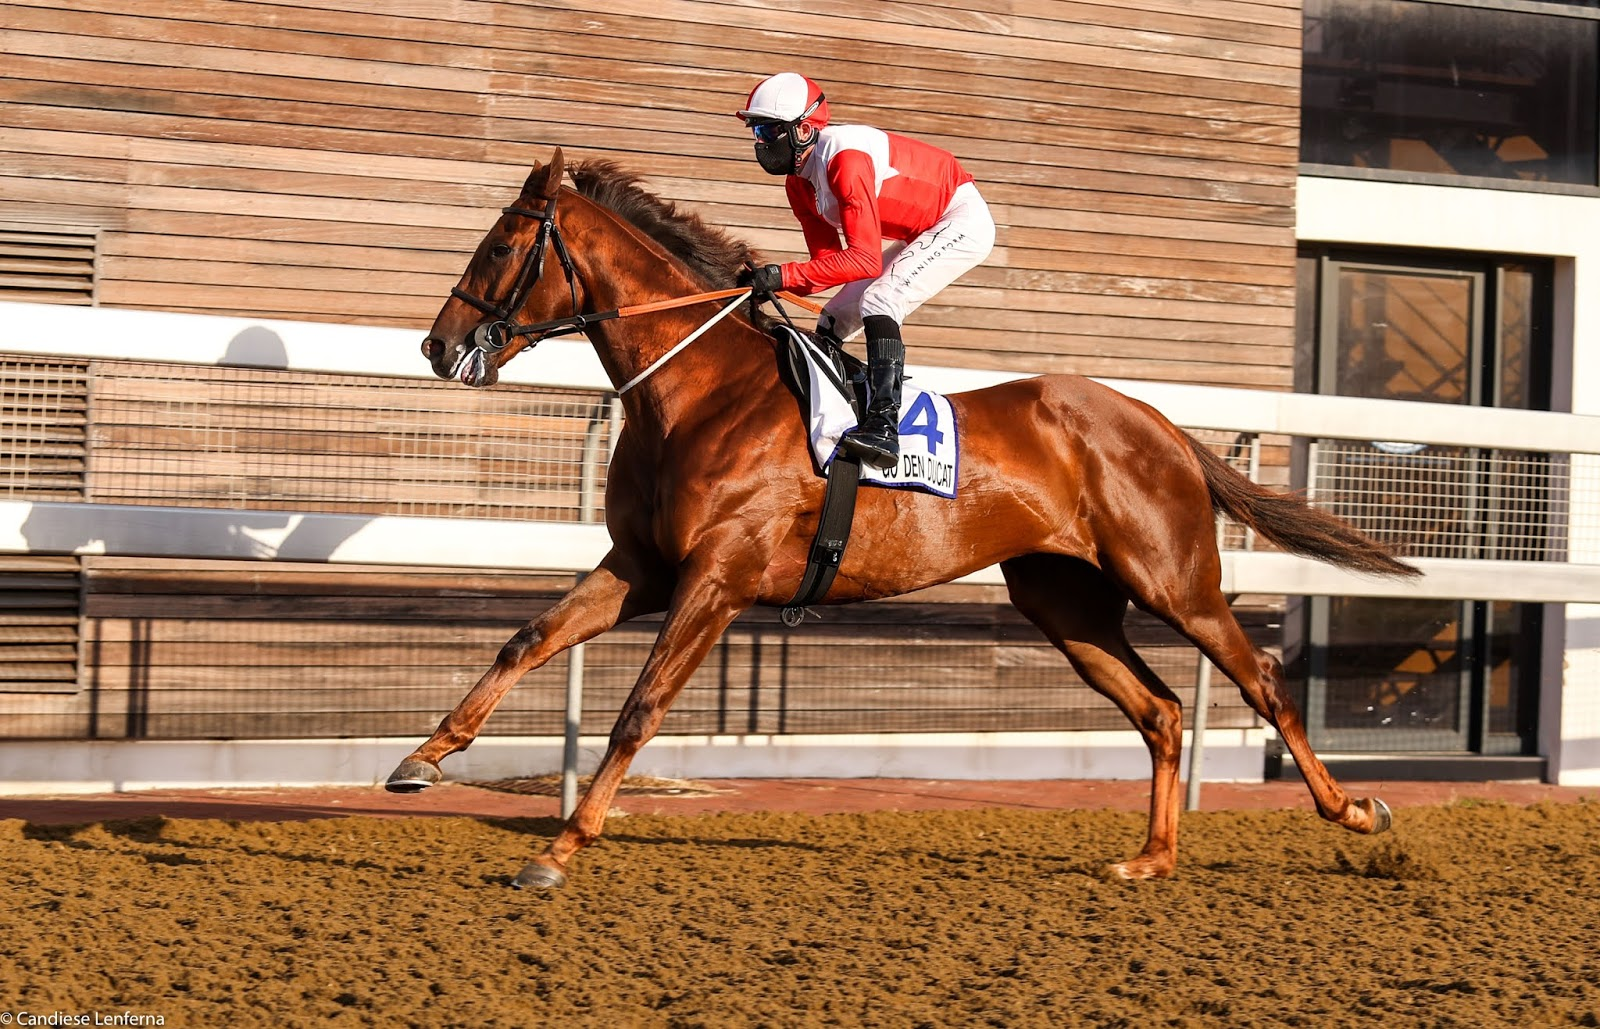 Vodacom Durban July 2020 Horse Profile - Golden Ducat